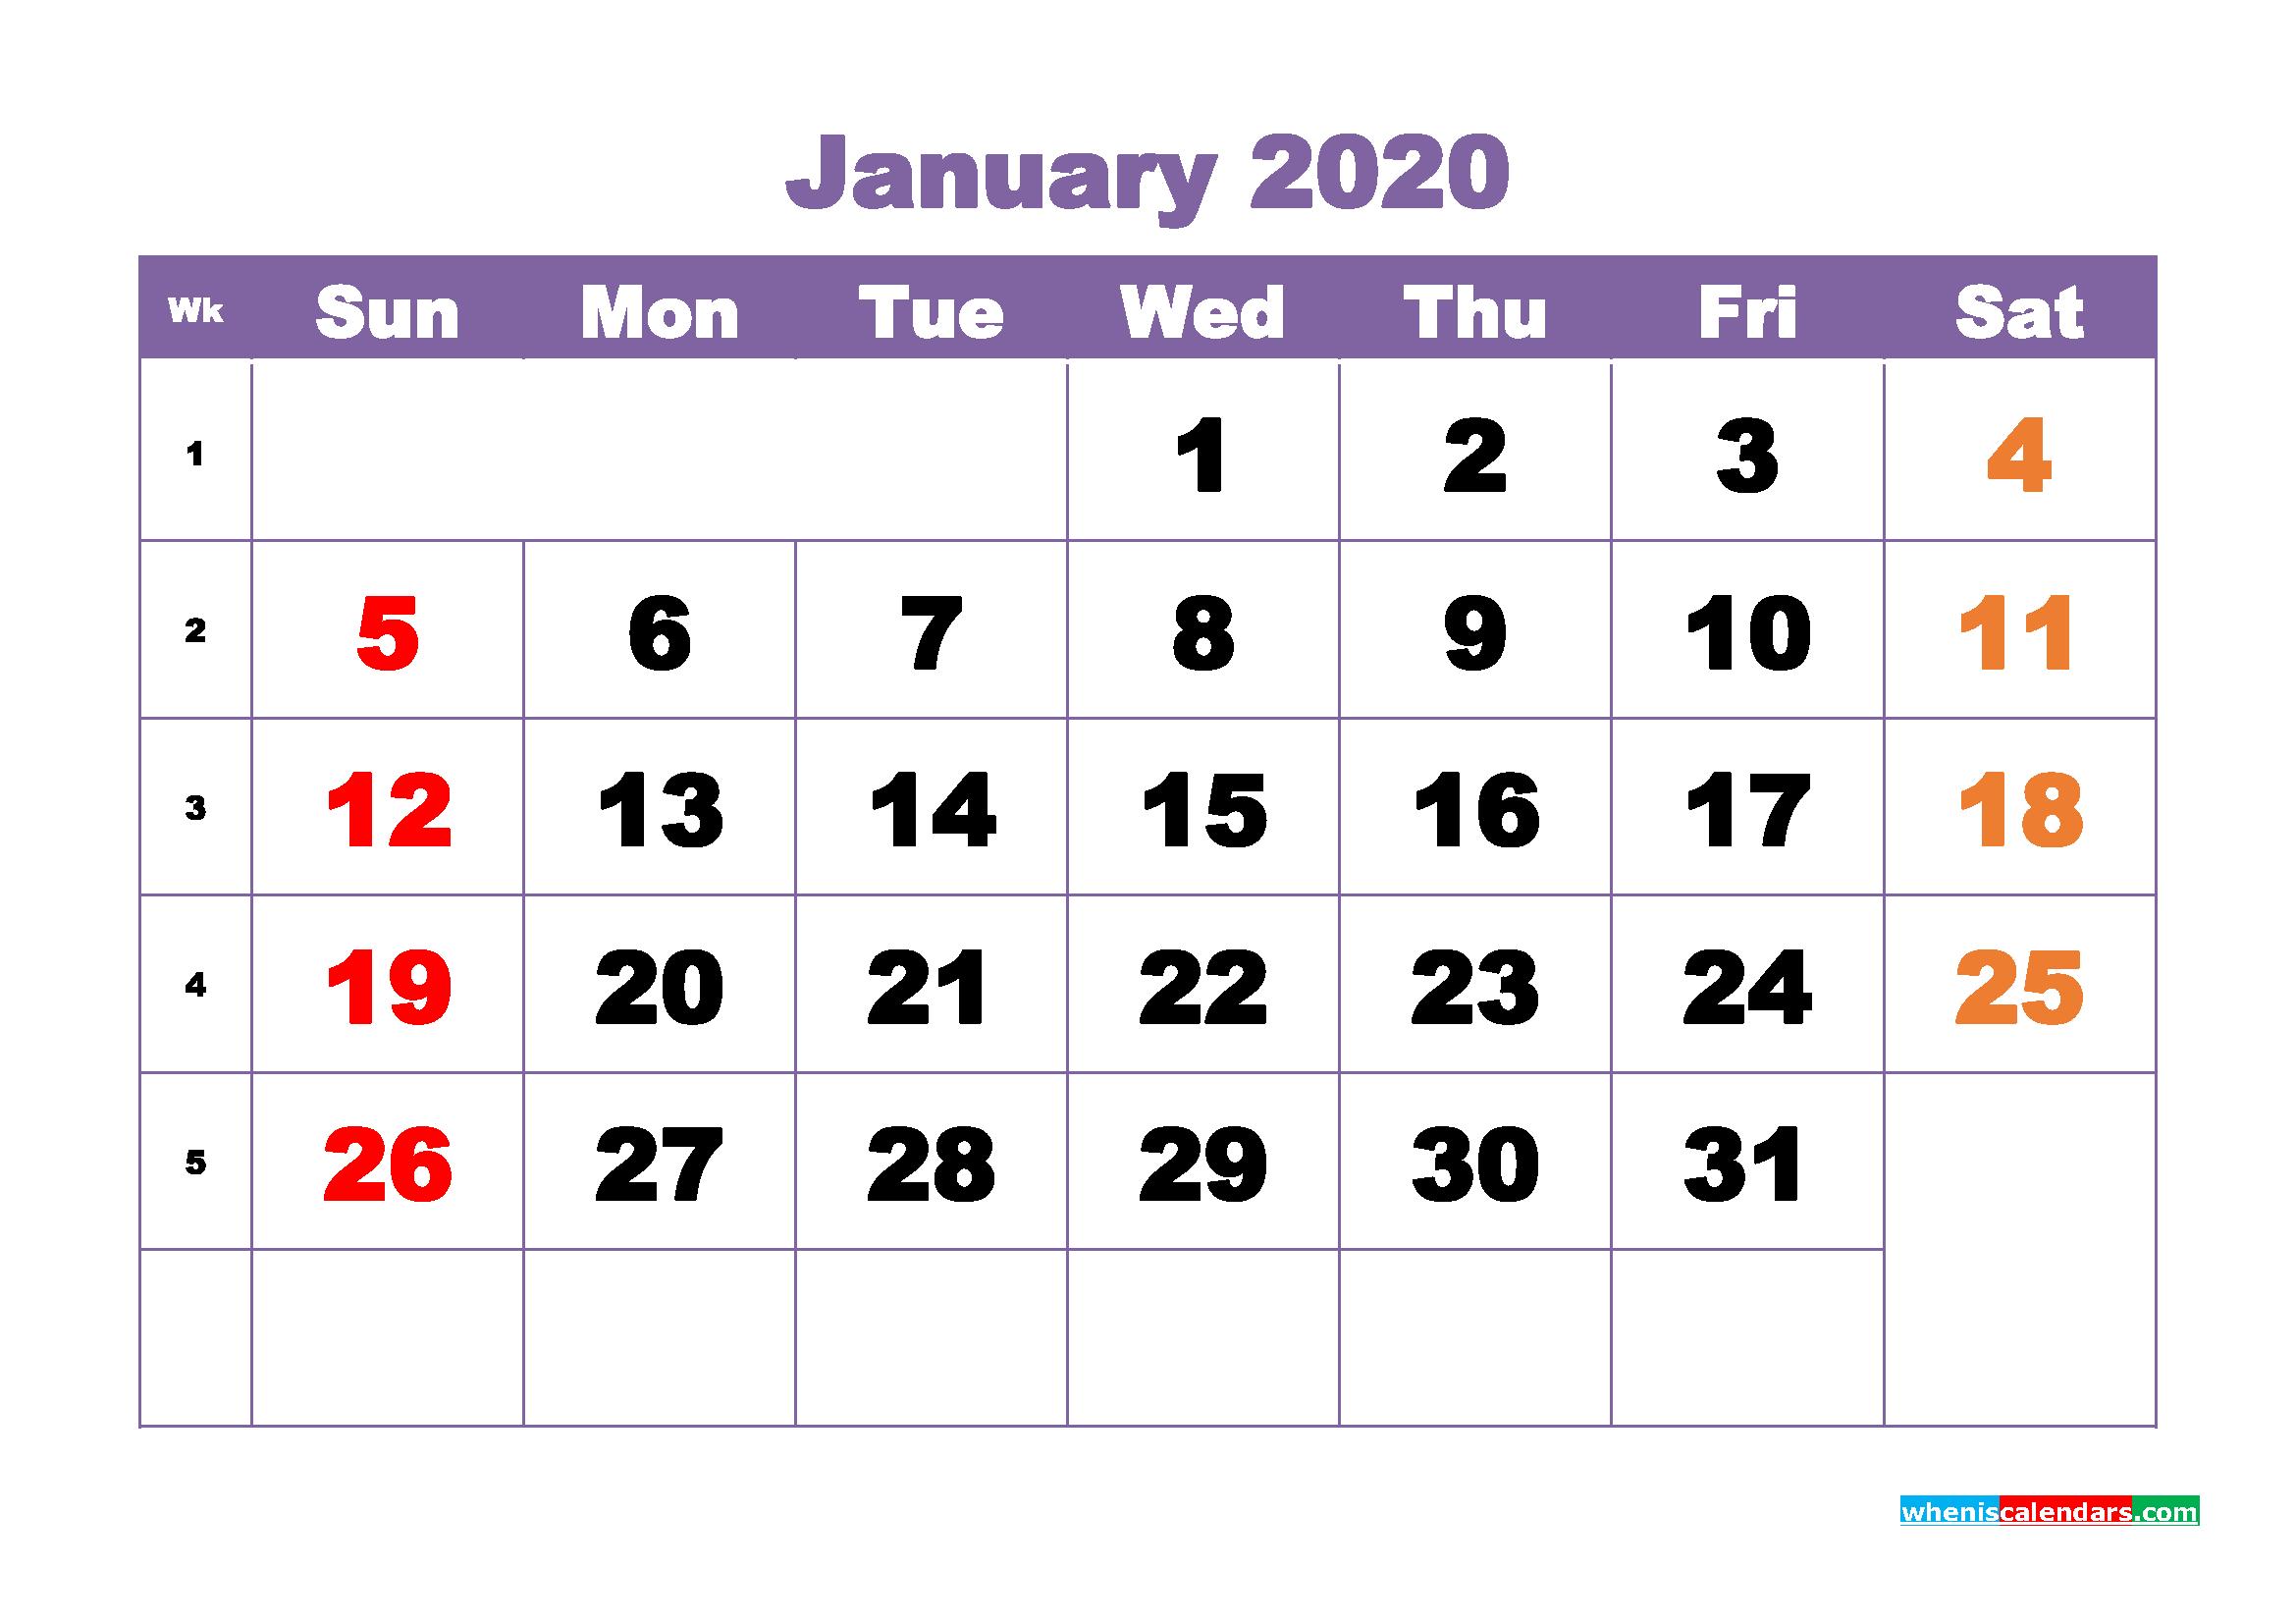 January Printable Calendar 2020 PDF, Word - No.m20b373